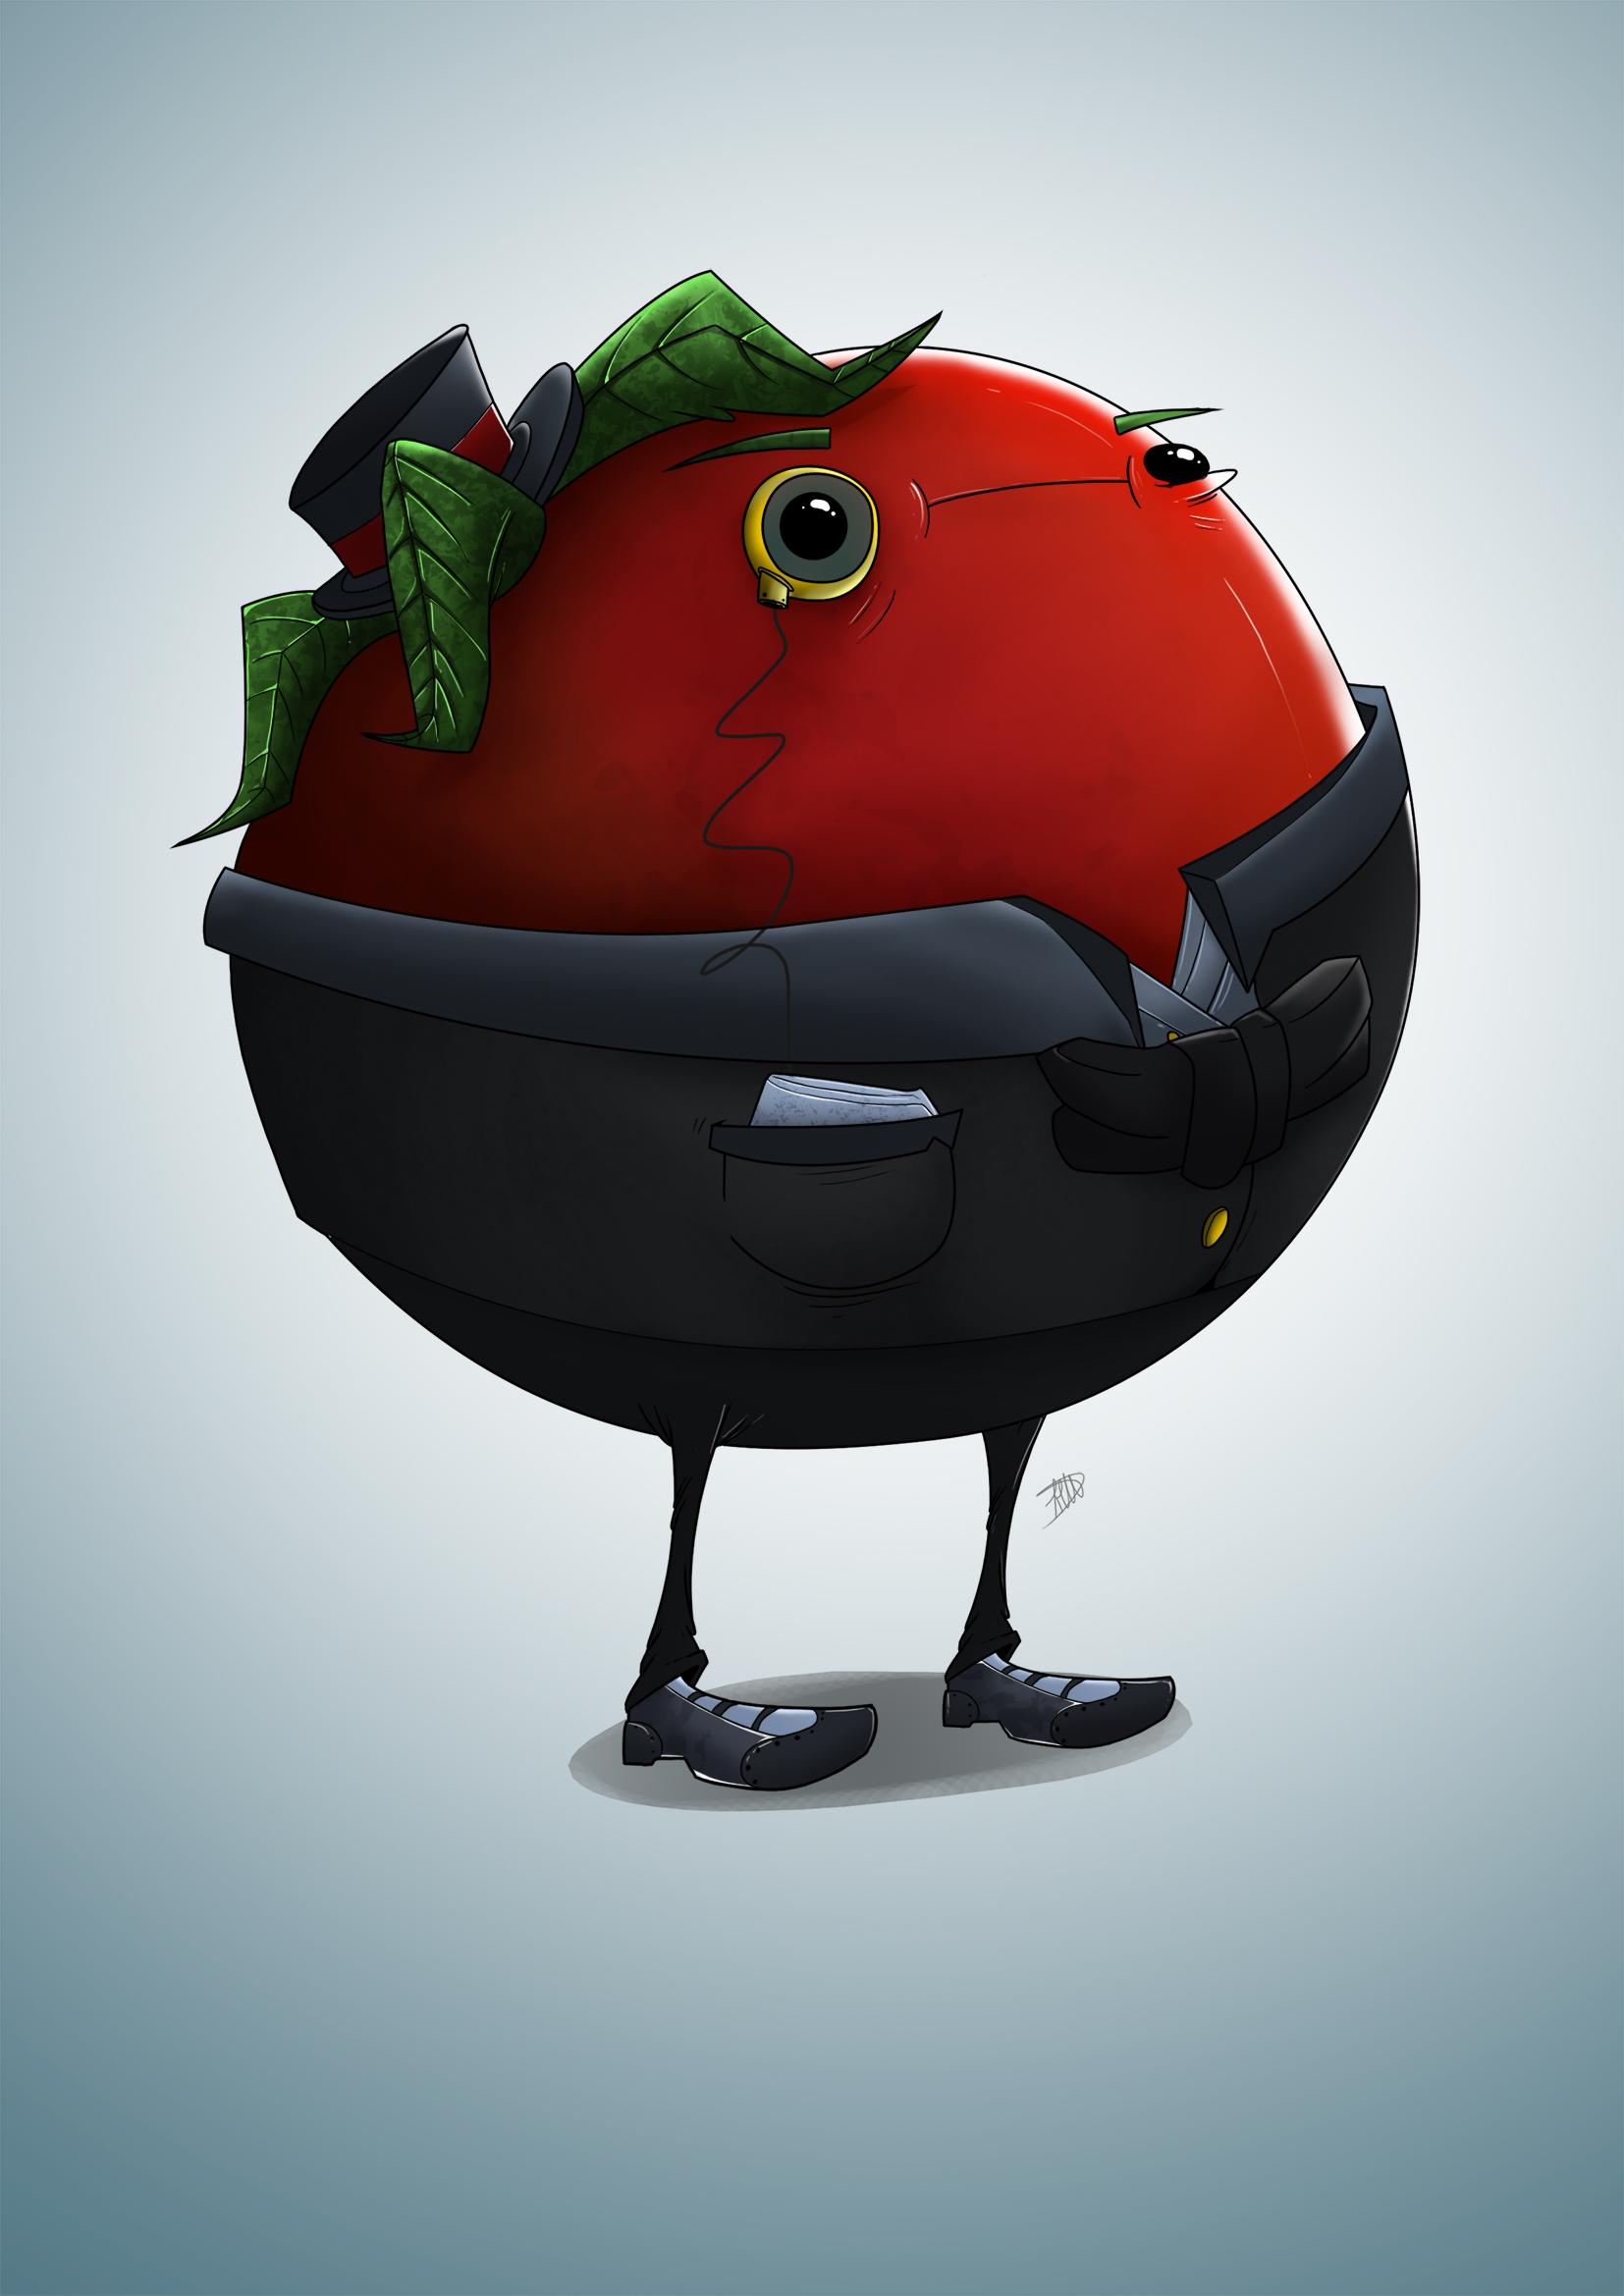 Mr.Tomato